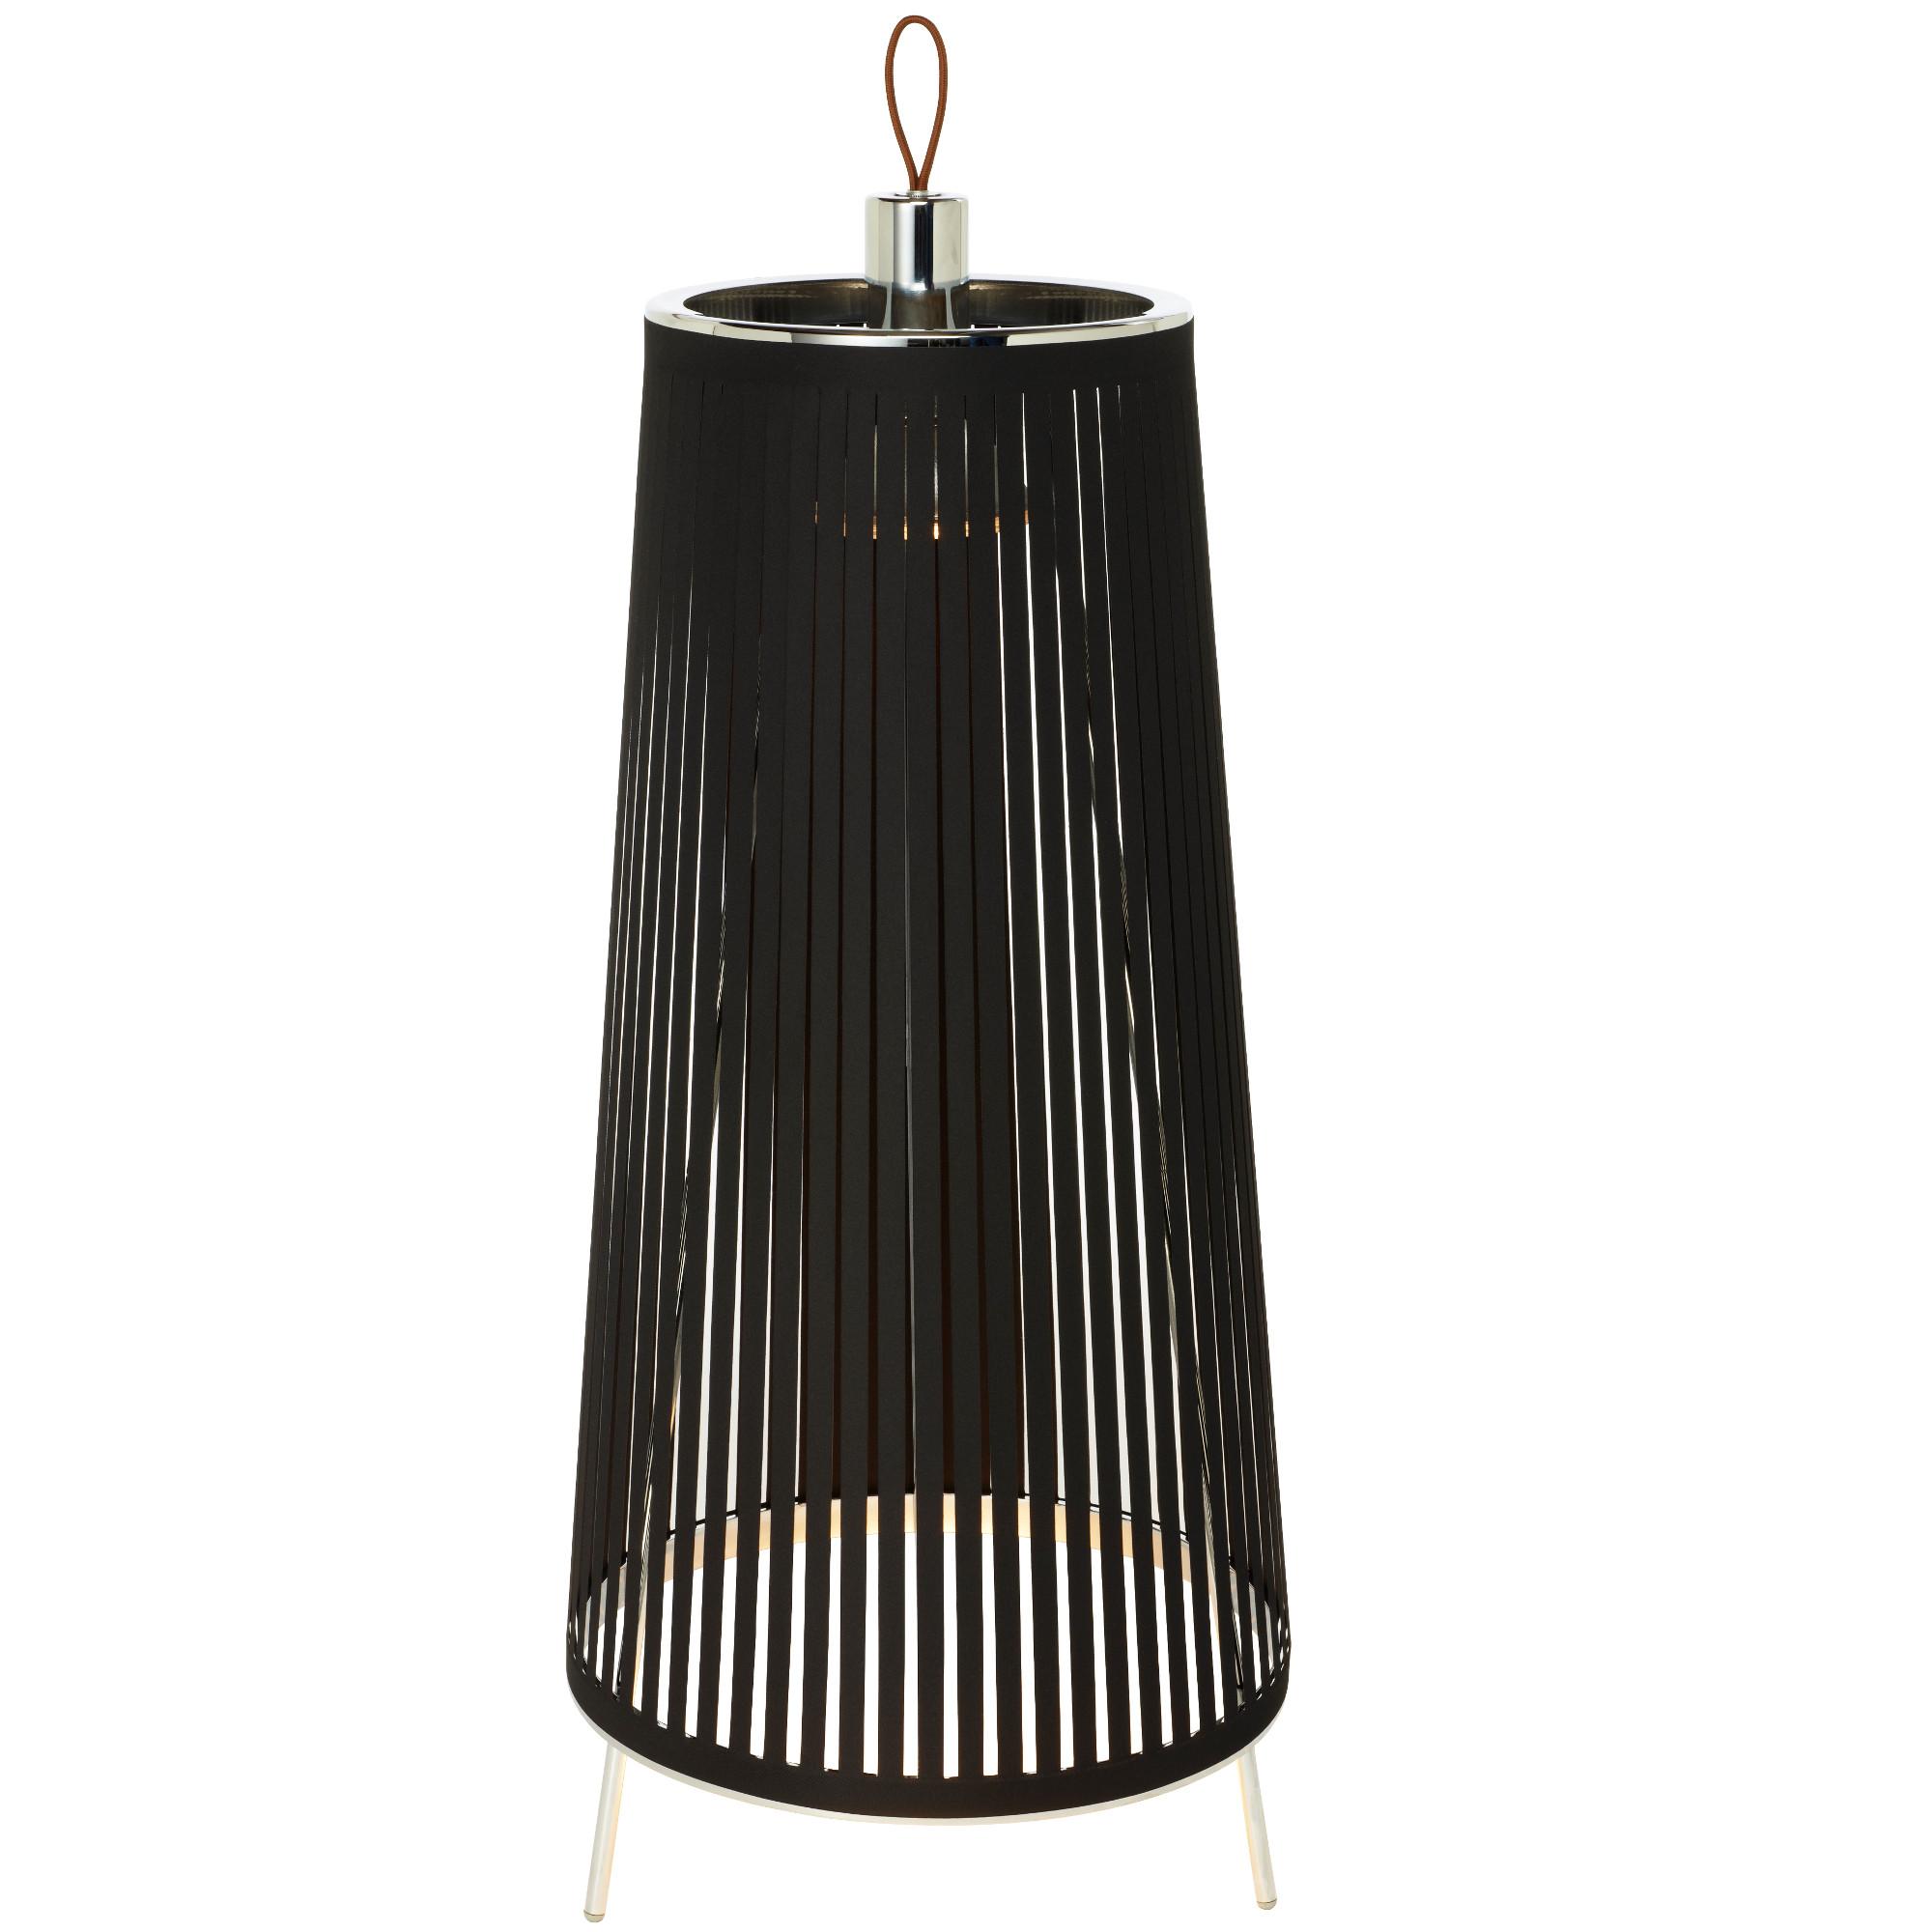 solis freestanding floor lamp by pablo soli fs 24 blk